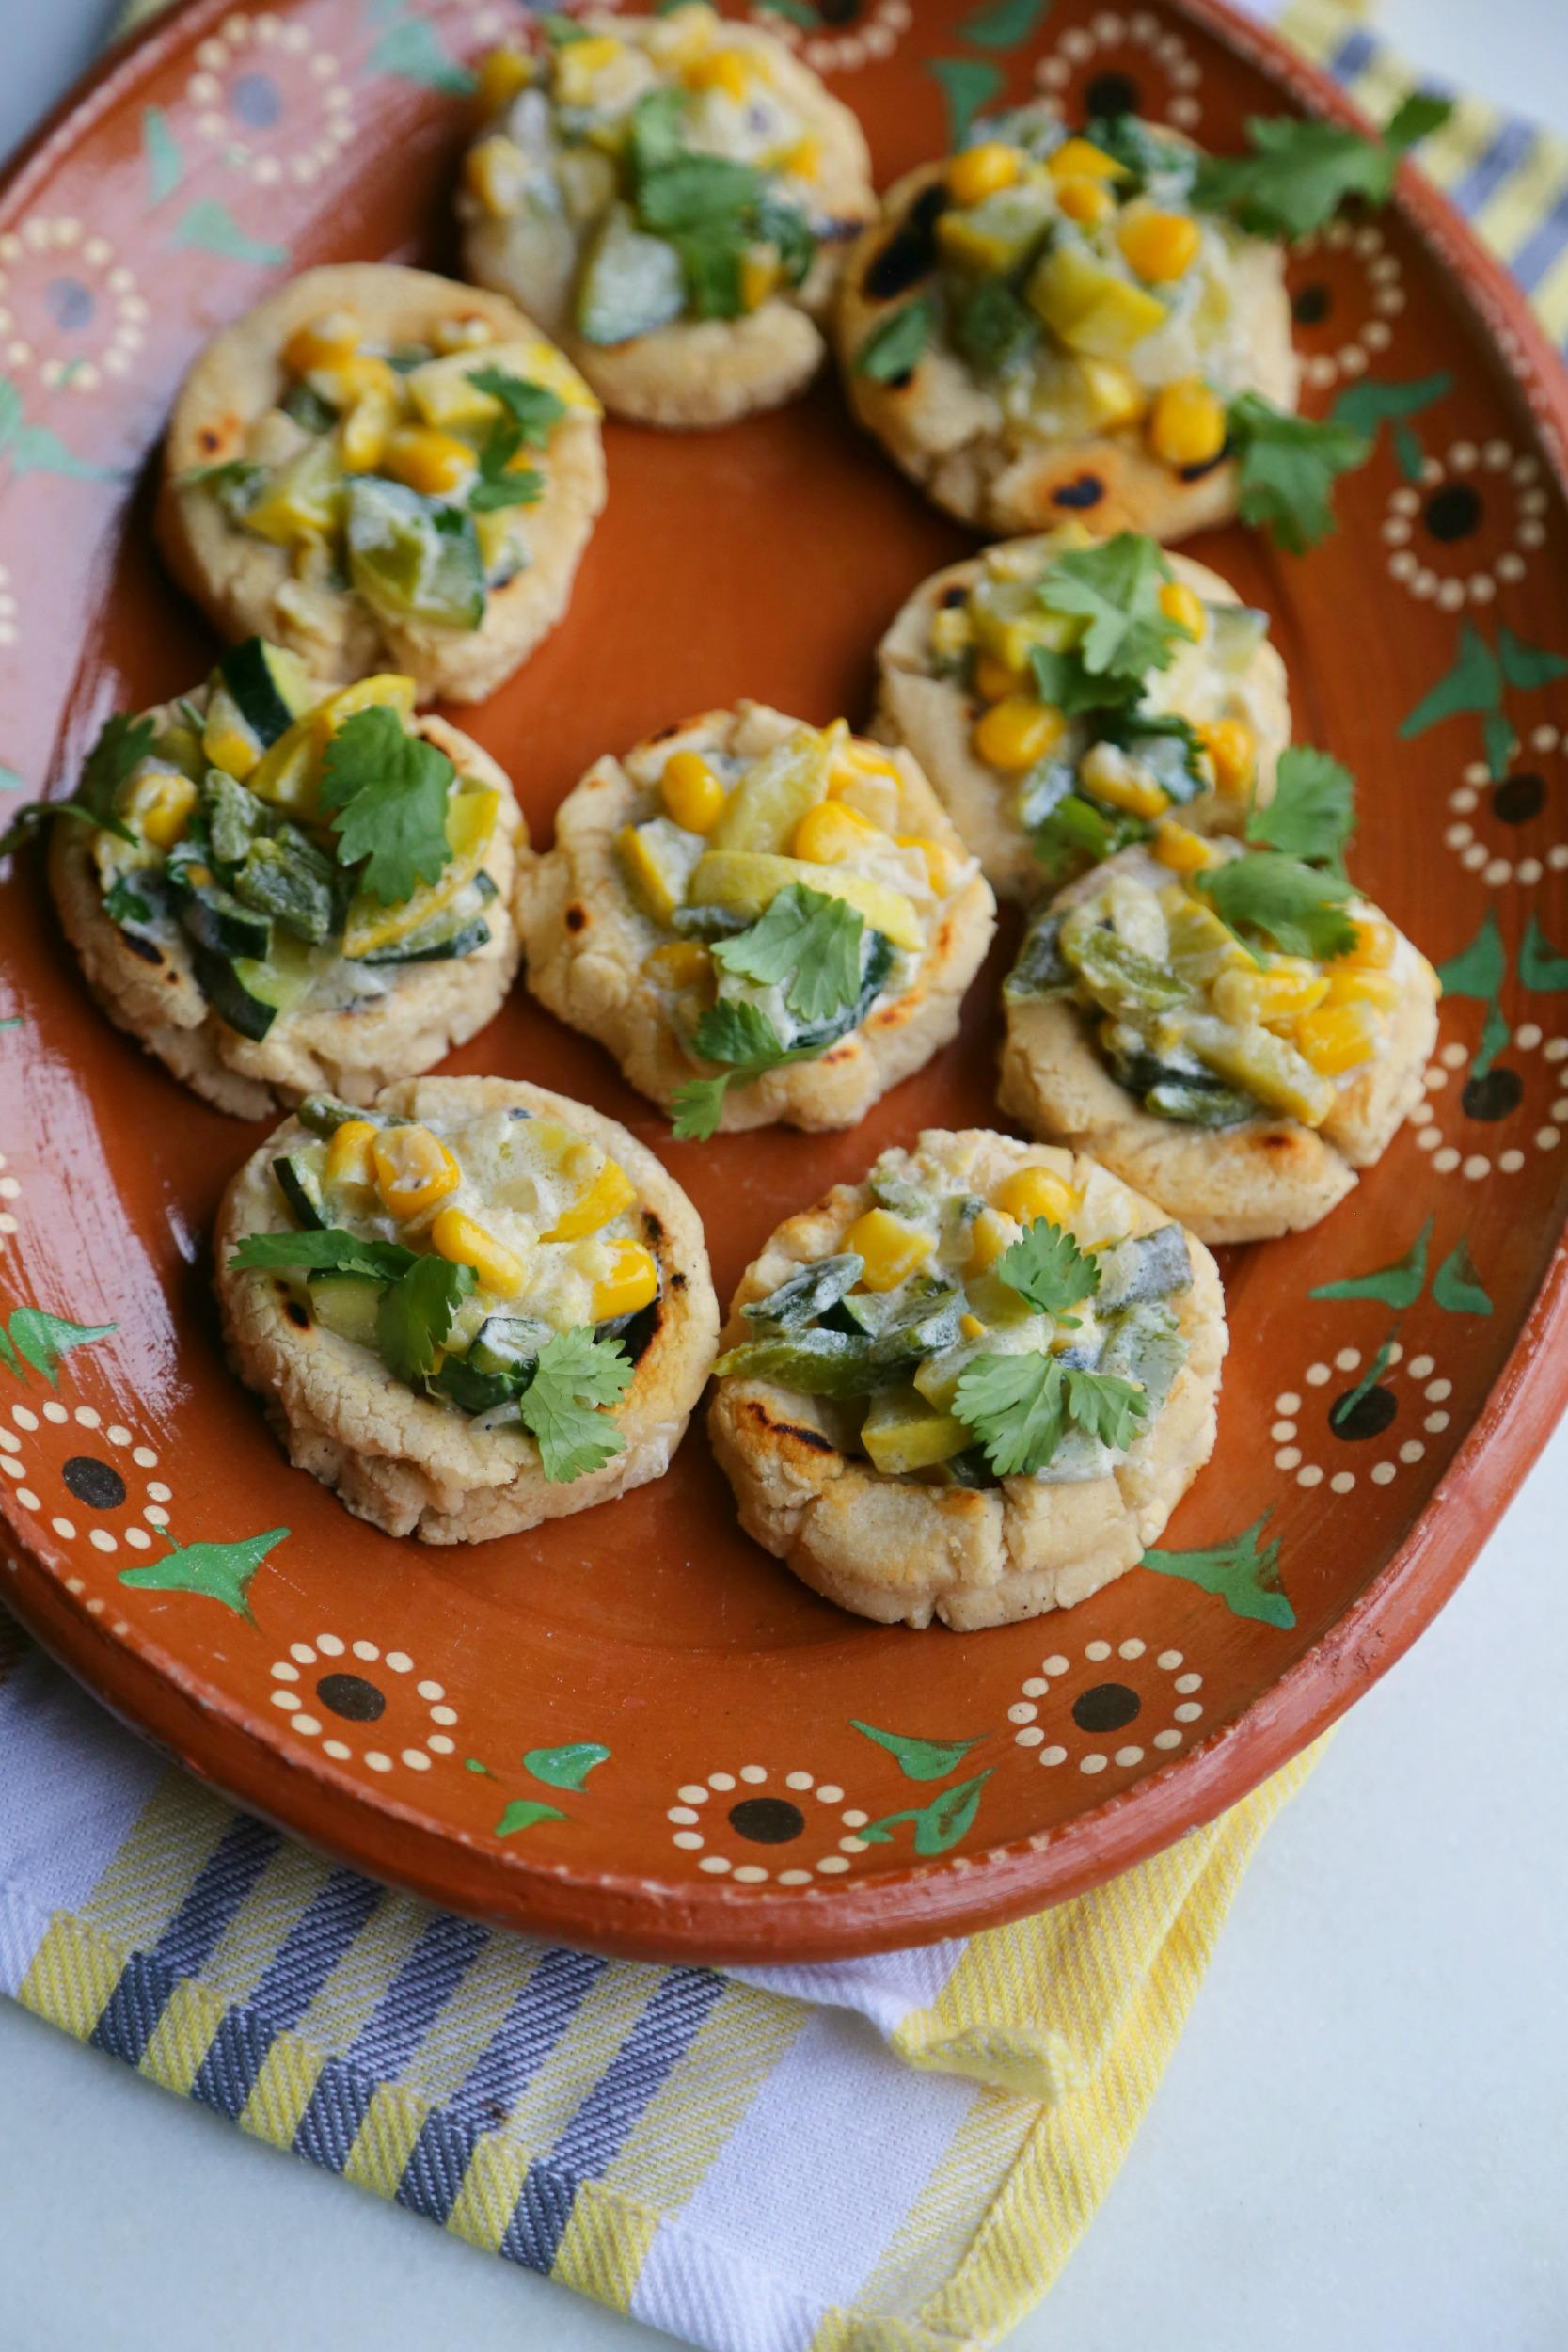 calabacitas-con-crema-mini-sopes-recipe-vianneyrodriguez-sweetlifebake